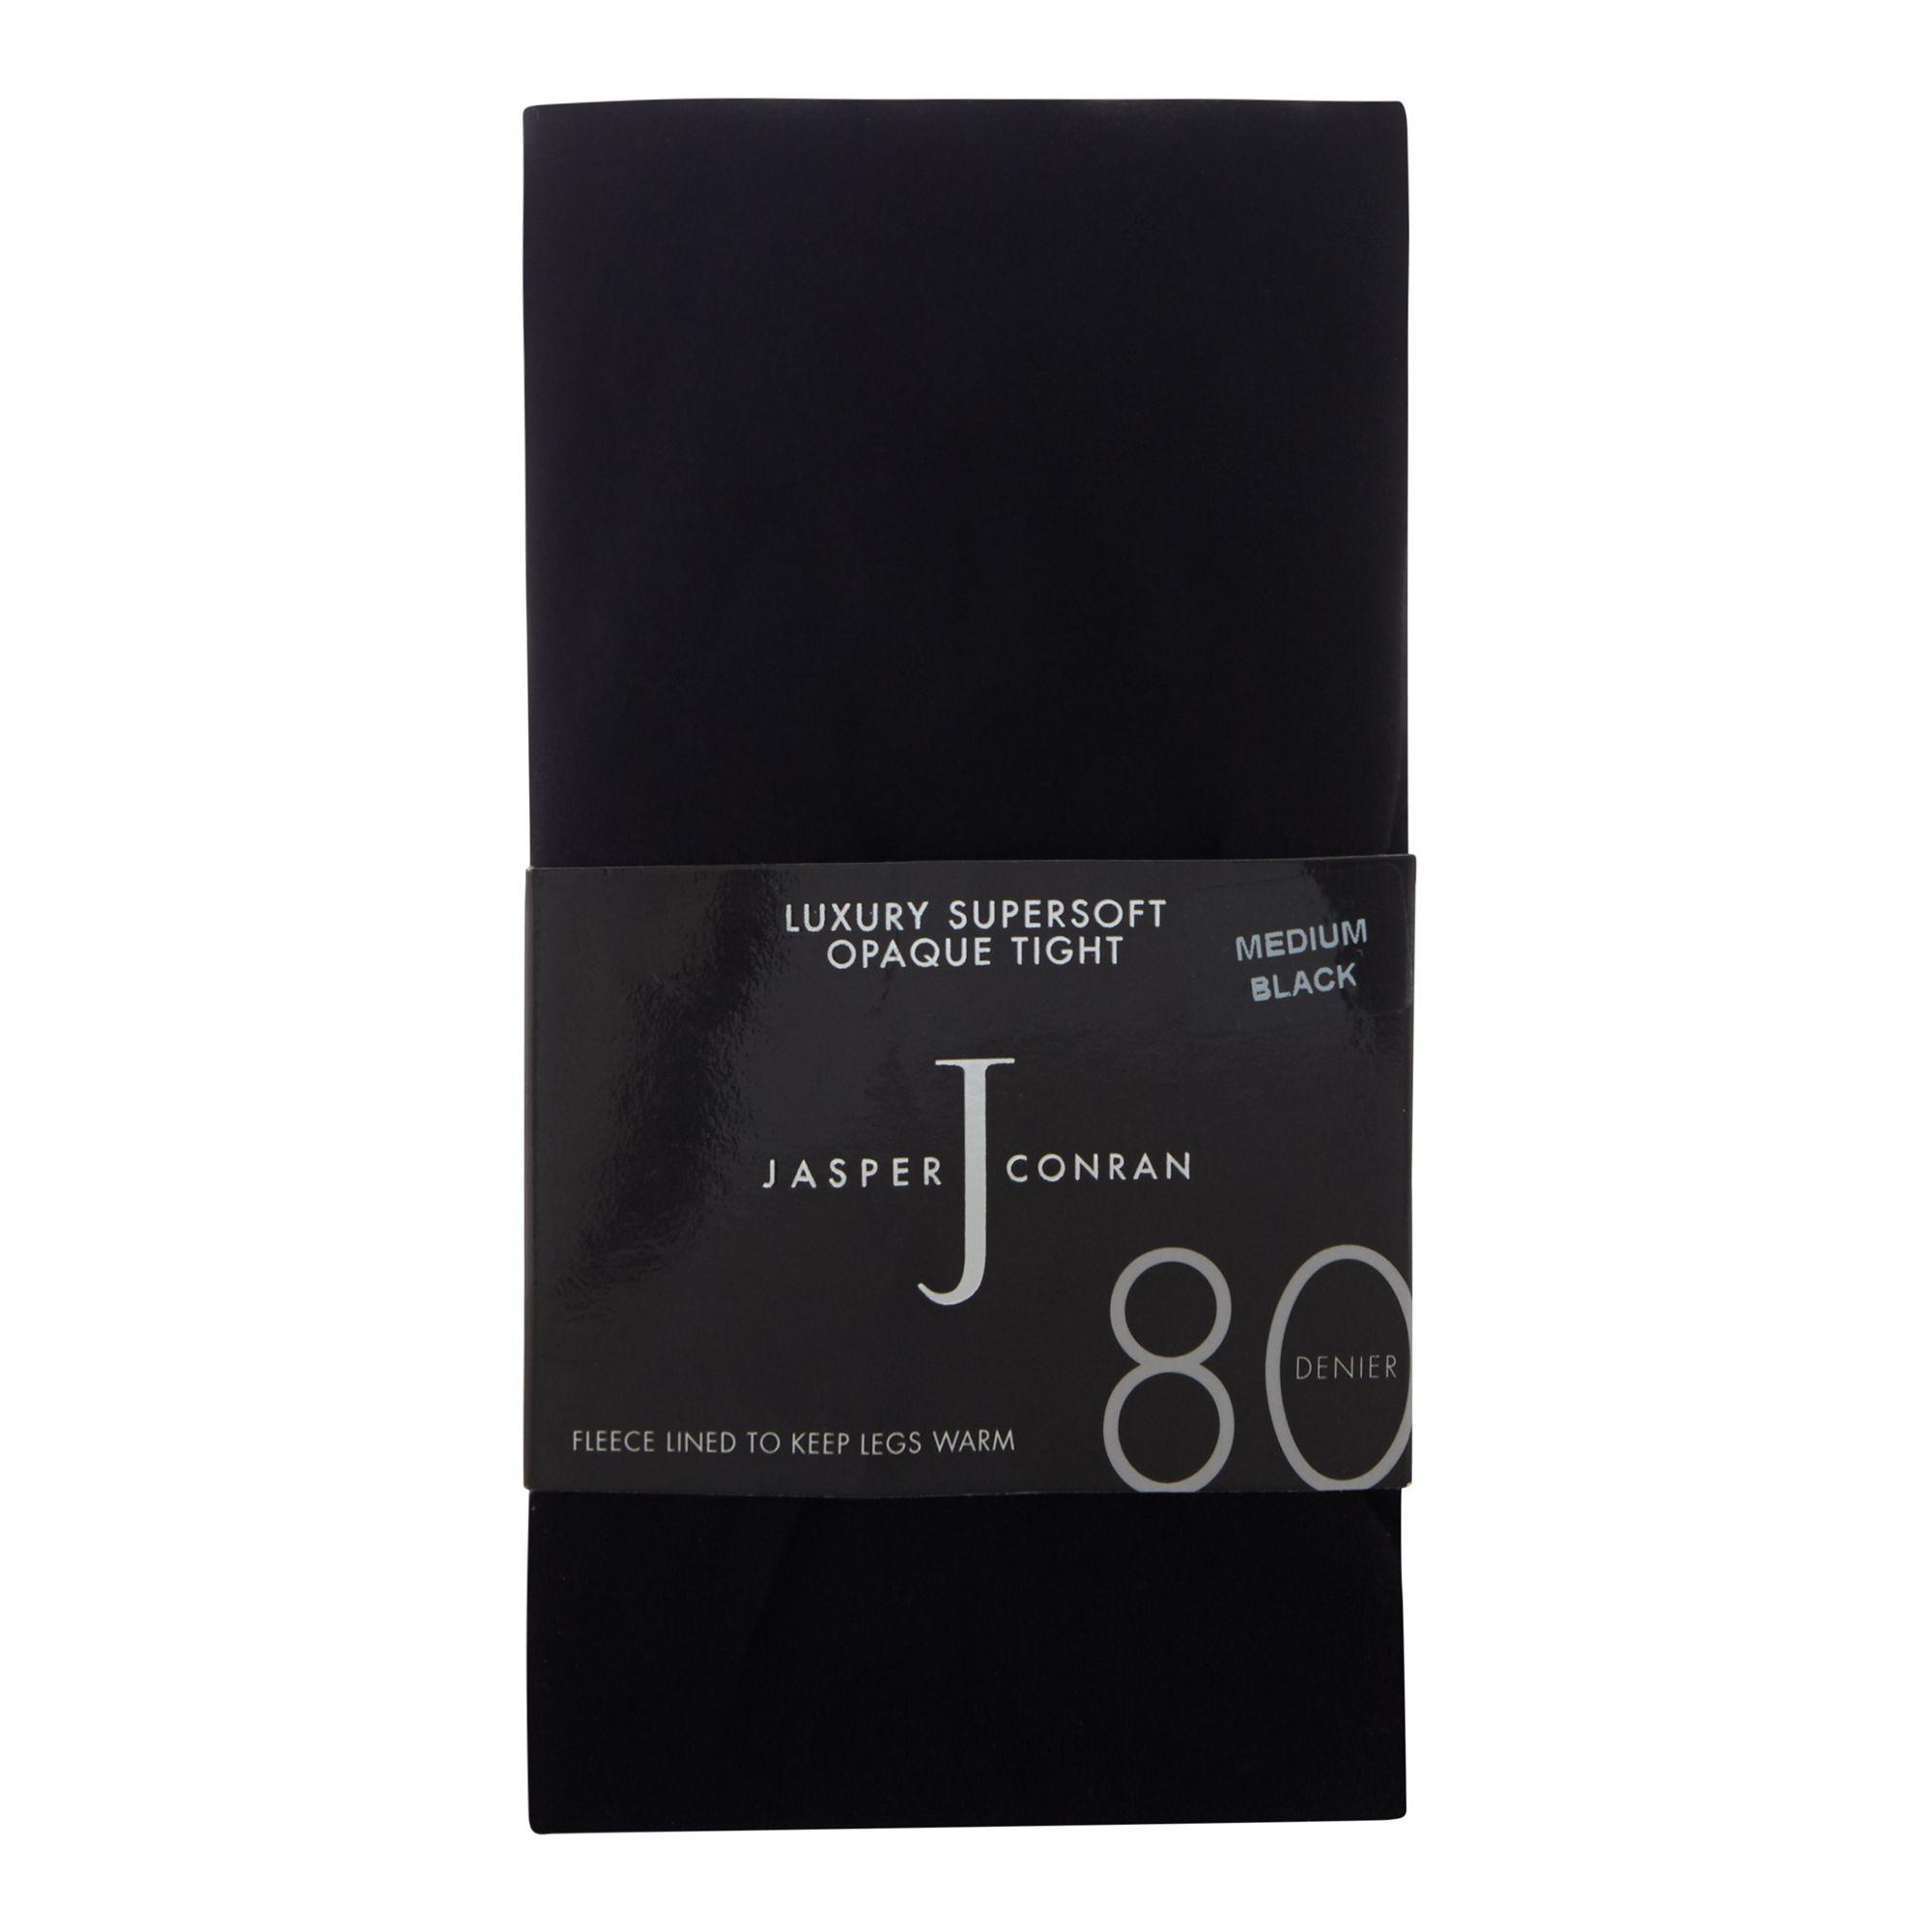 e4abcbd92 J By Jasper Conran - Black 80 Denier Super Soft Tights - Lyst. View  fullscreen